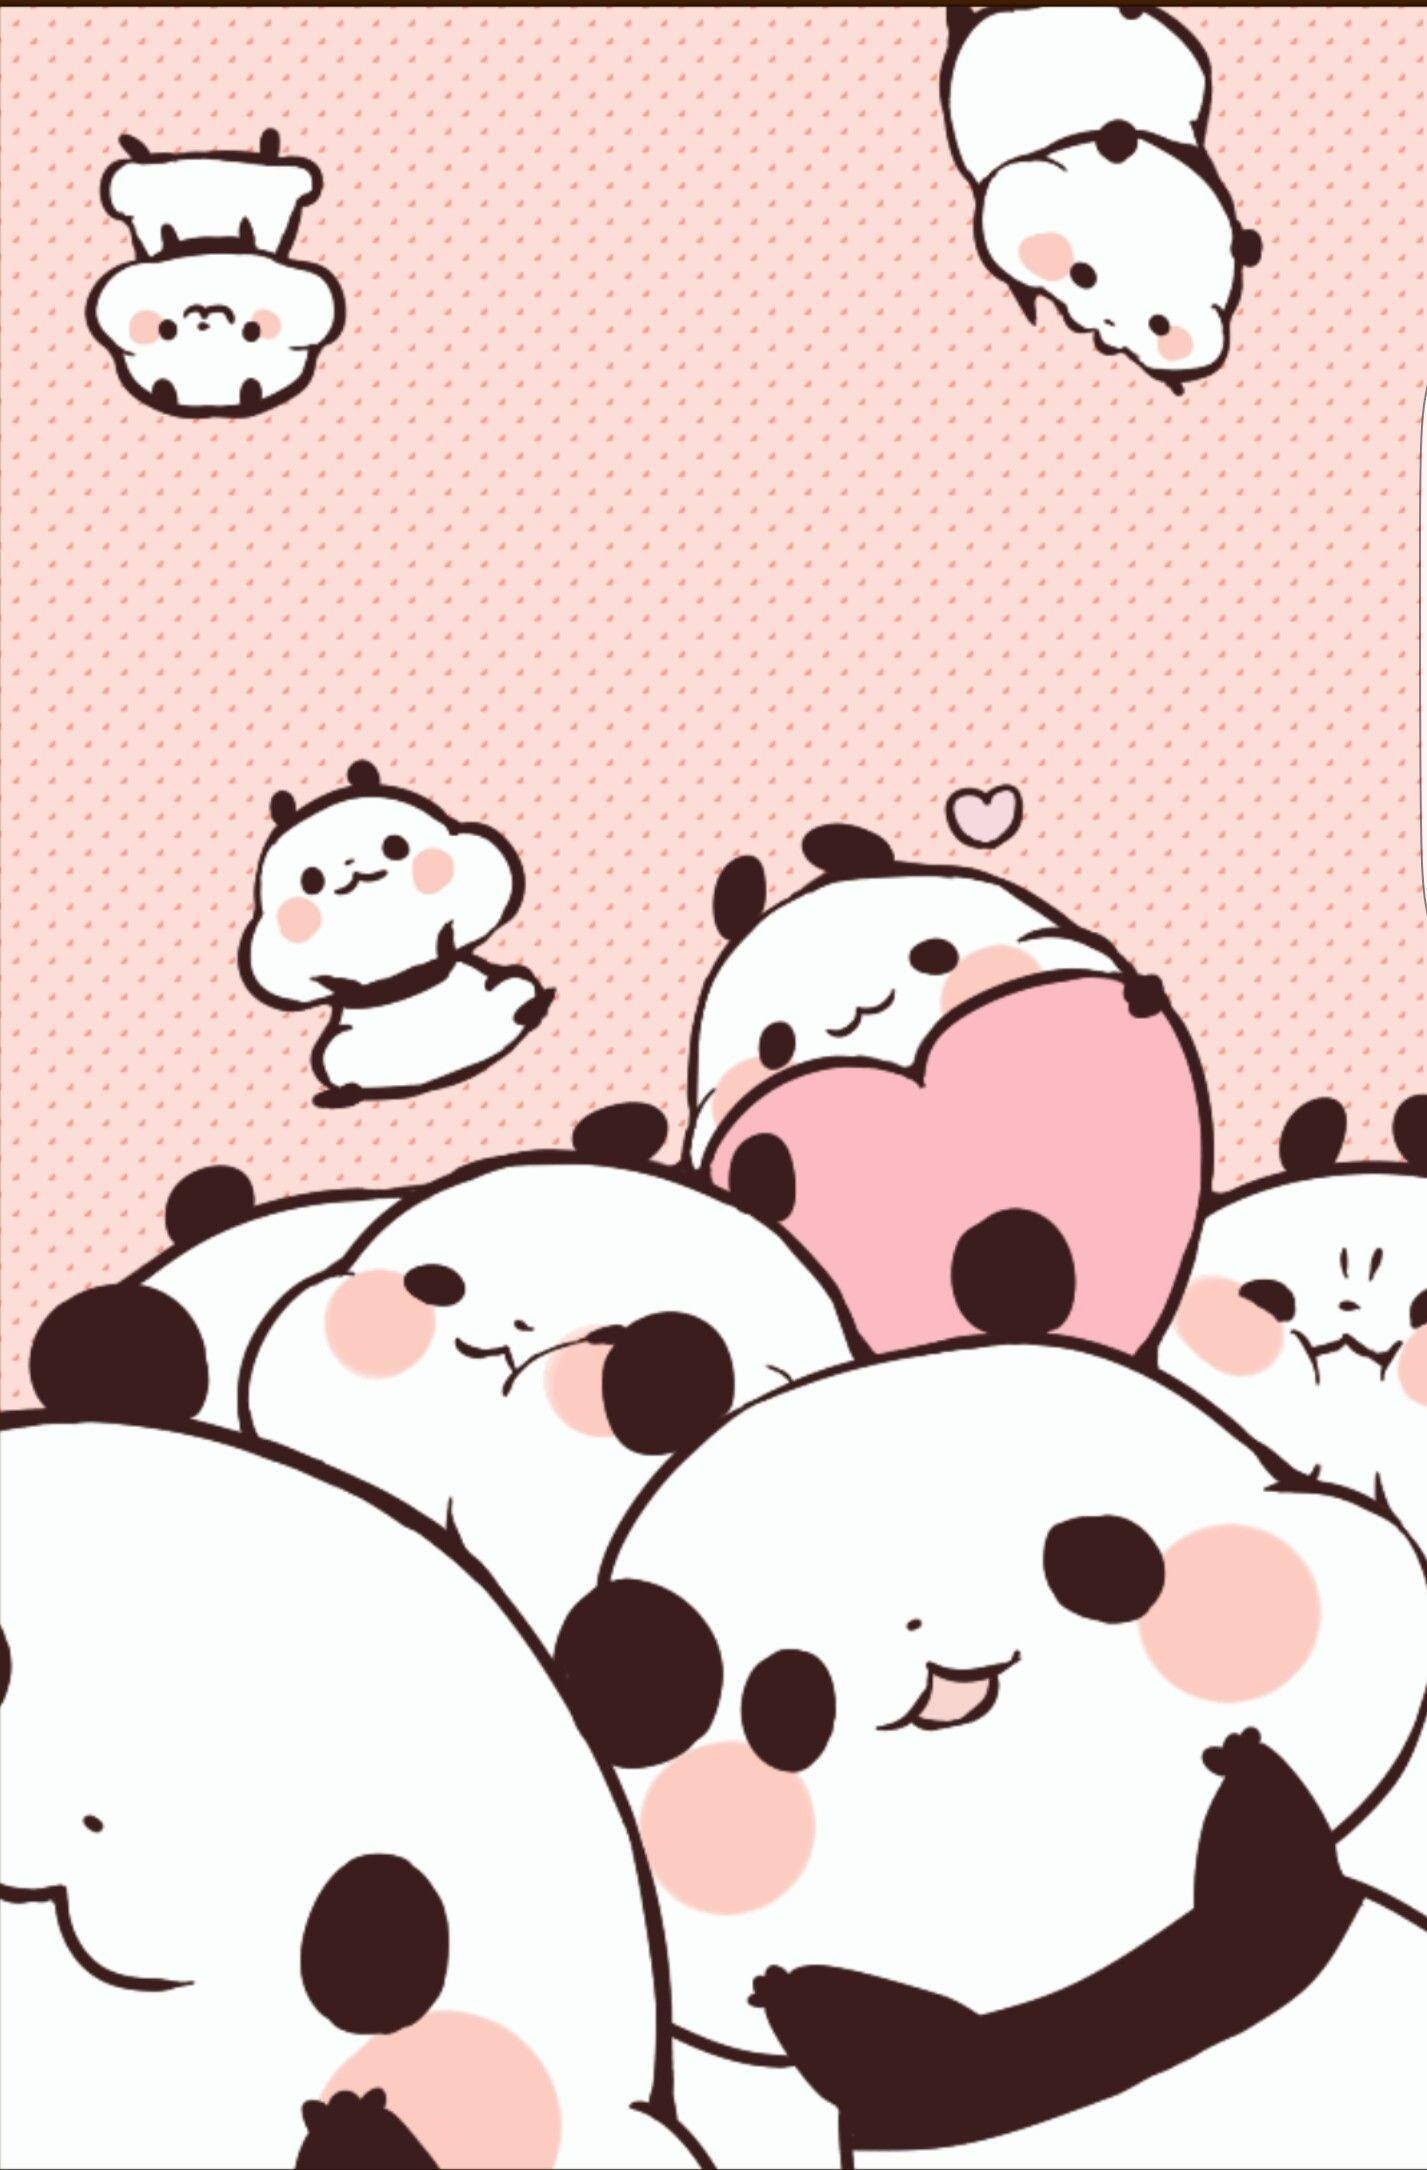 Mais Popular Kawaii Panda Papel De Parede 1427x2170 Para Xiaomi 751397519064537963 In 2020 Cute Panda Wallpaper Cute Cartoon Wallpapers Cute Wallpapers